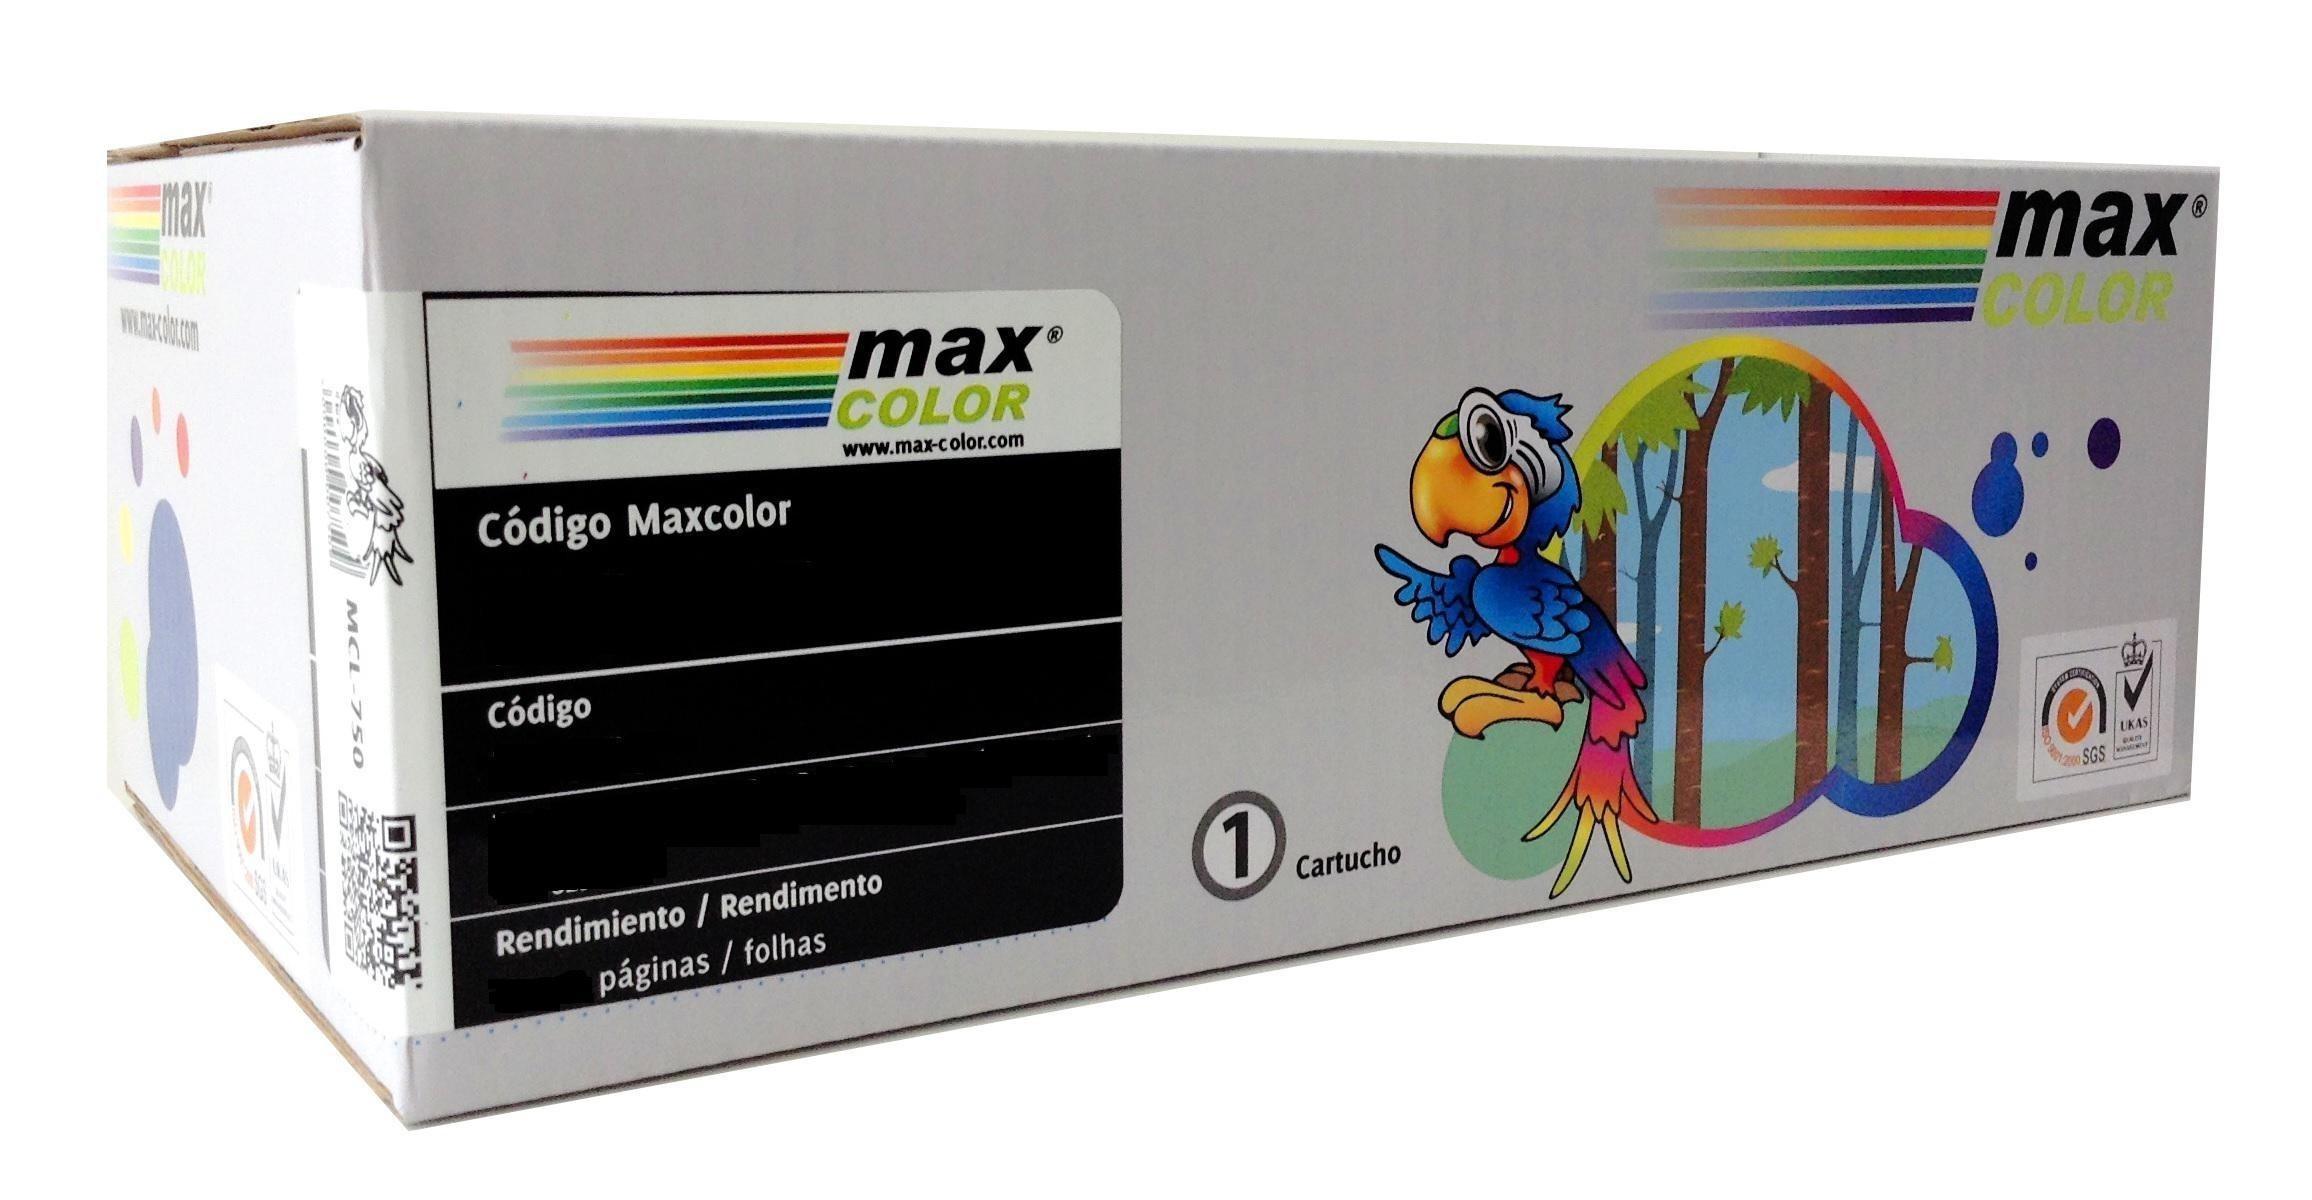 maxcolor-49x-53x